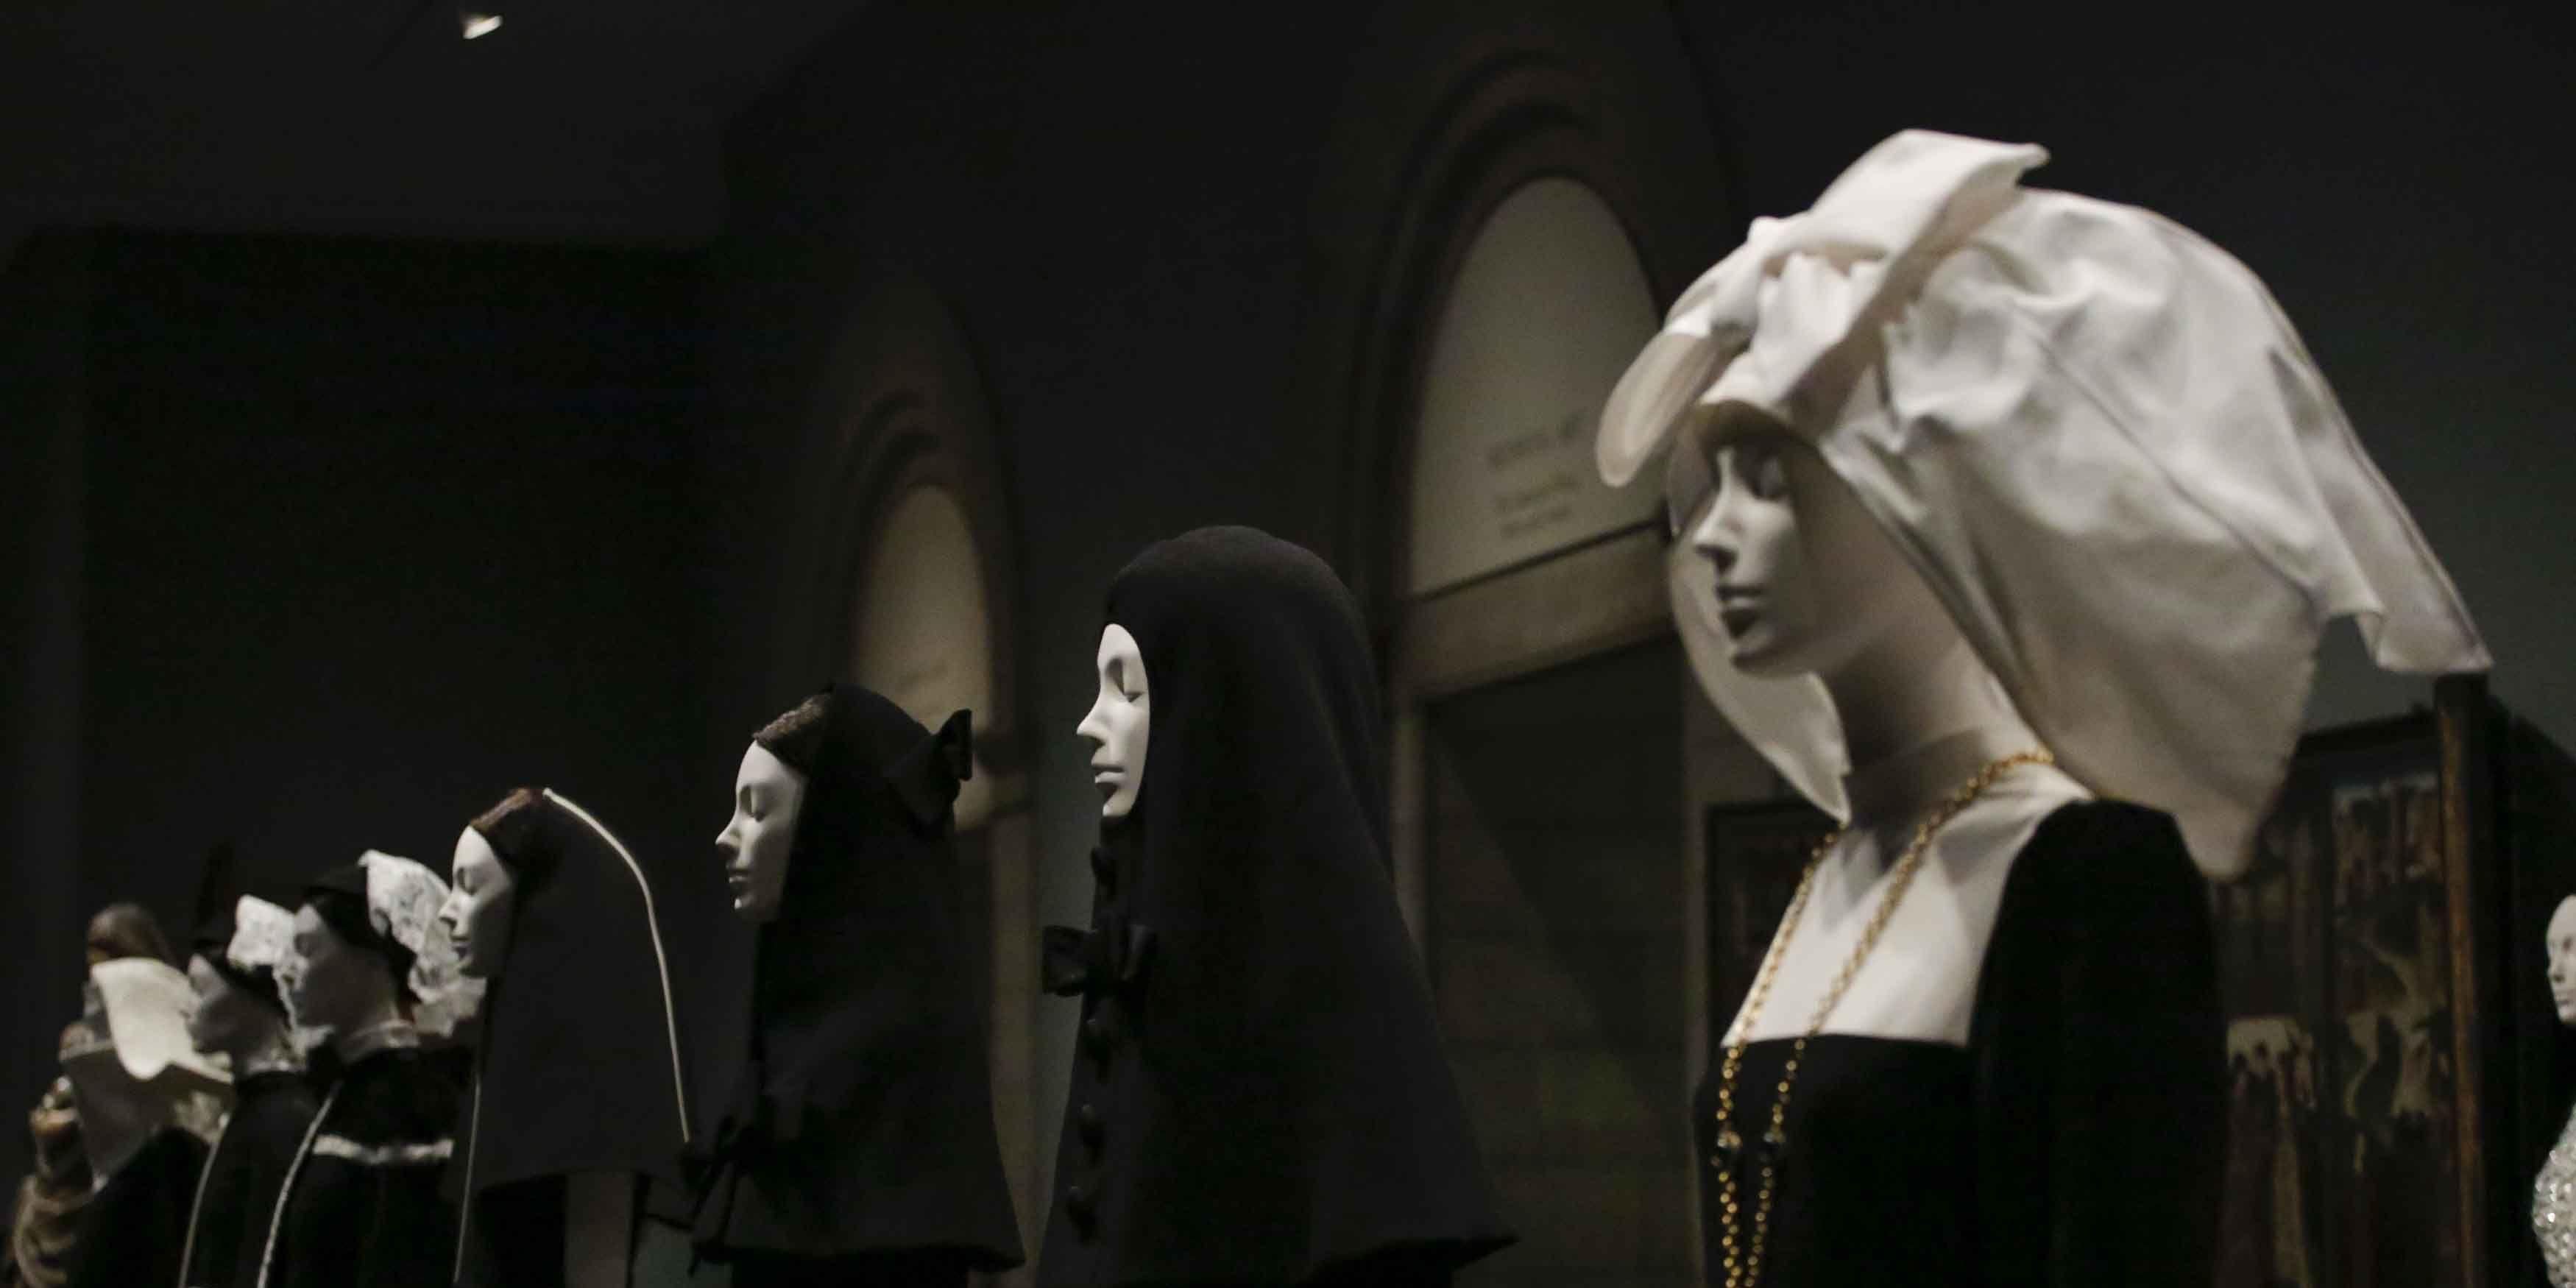 Heavenly Bodies:Fashion and the Catholic Imagination